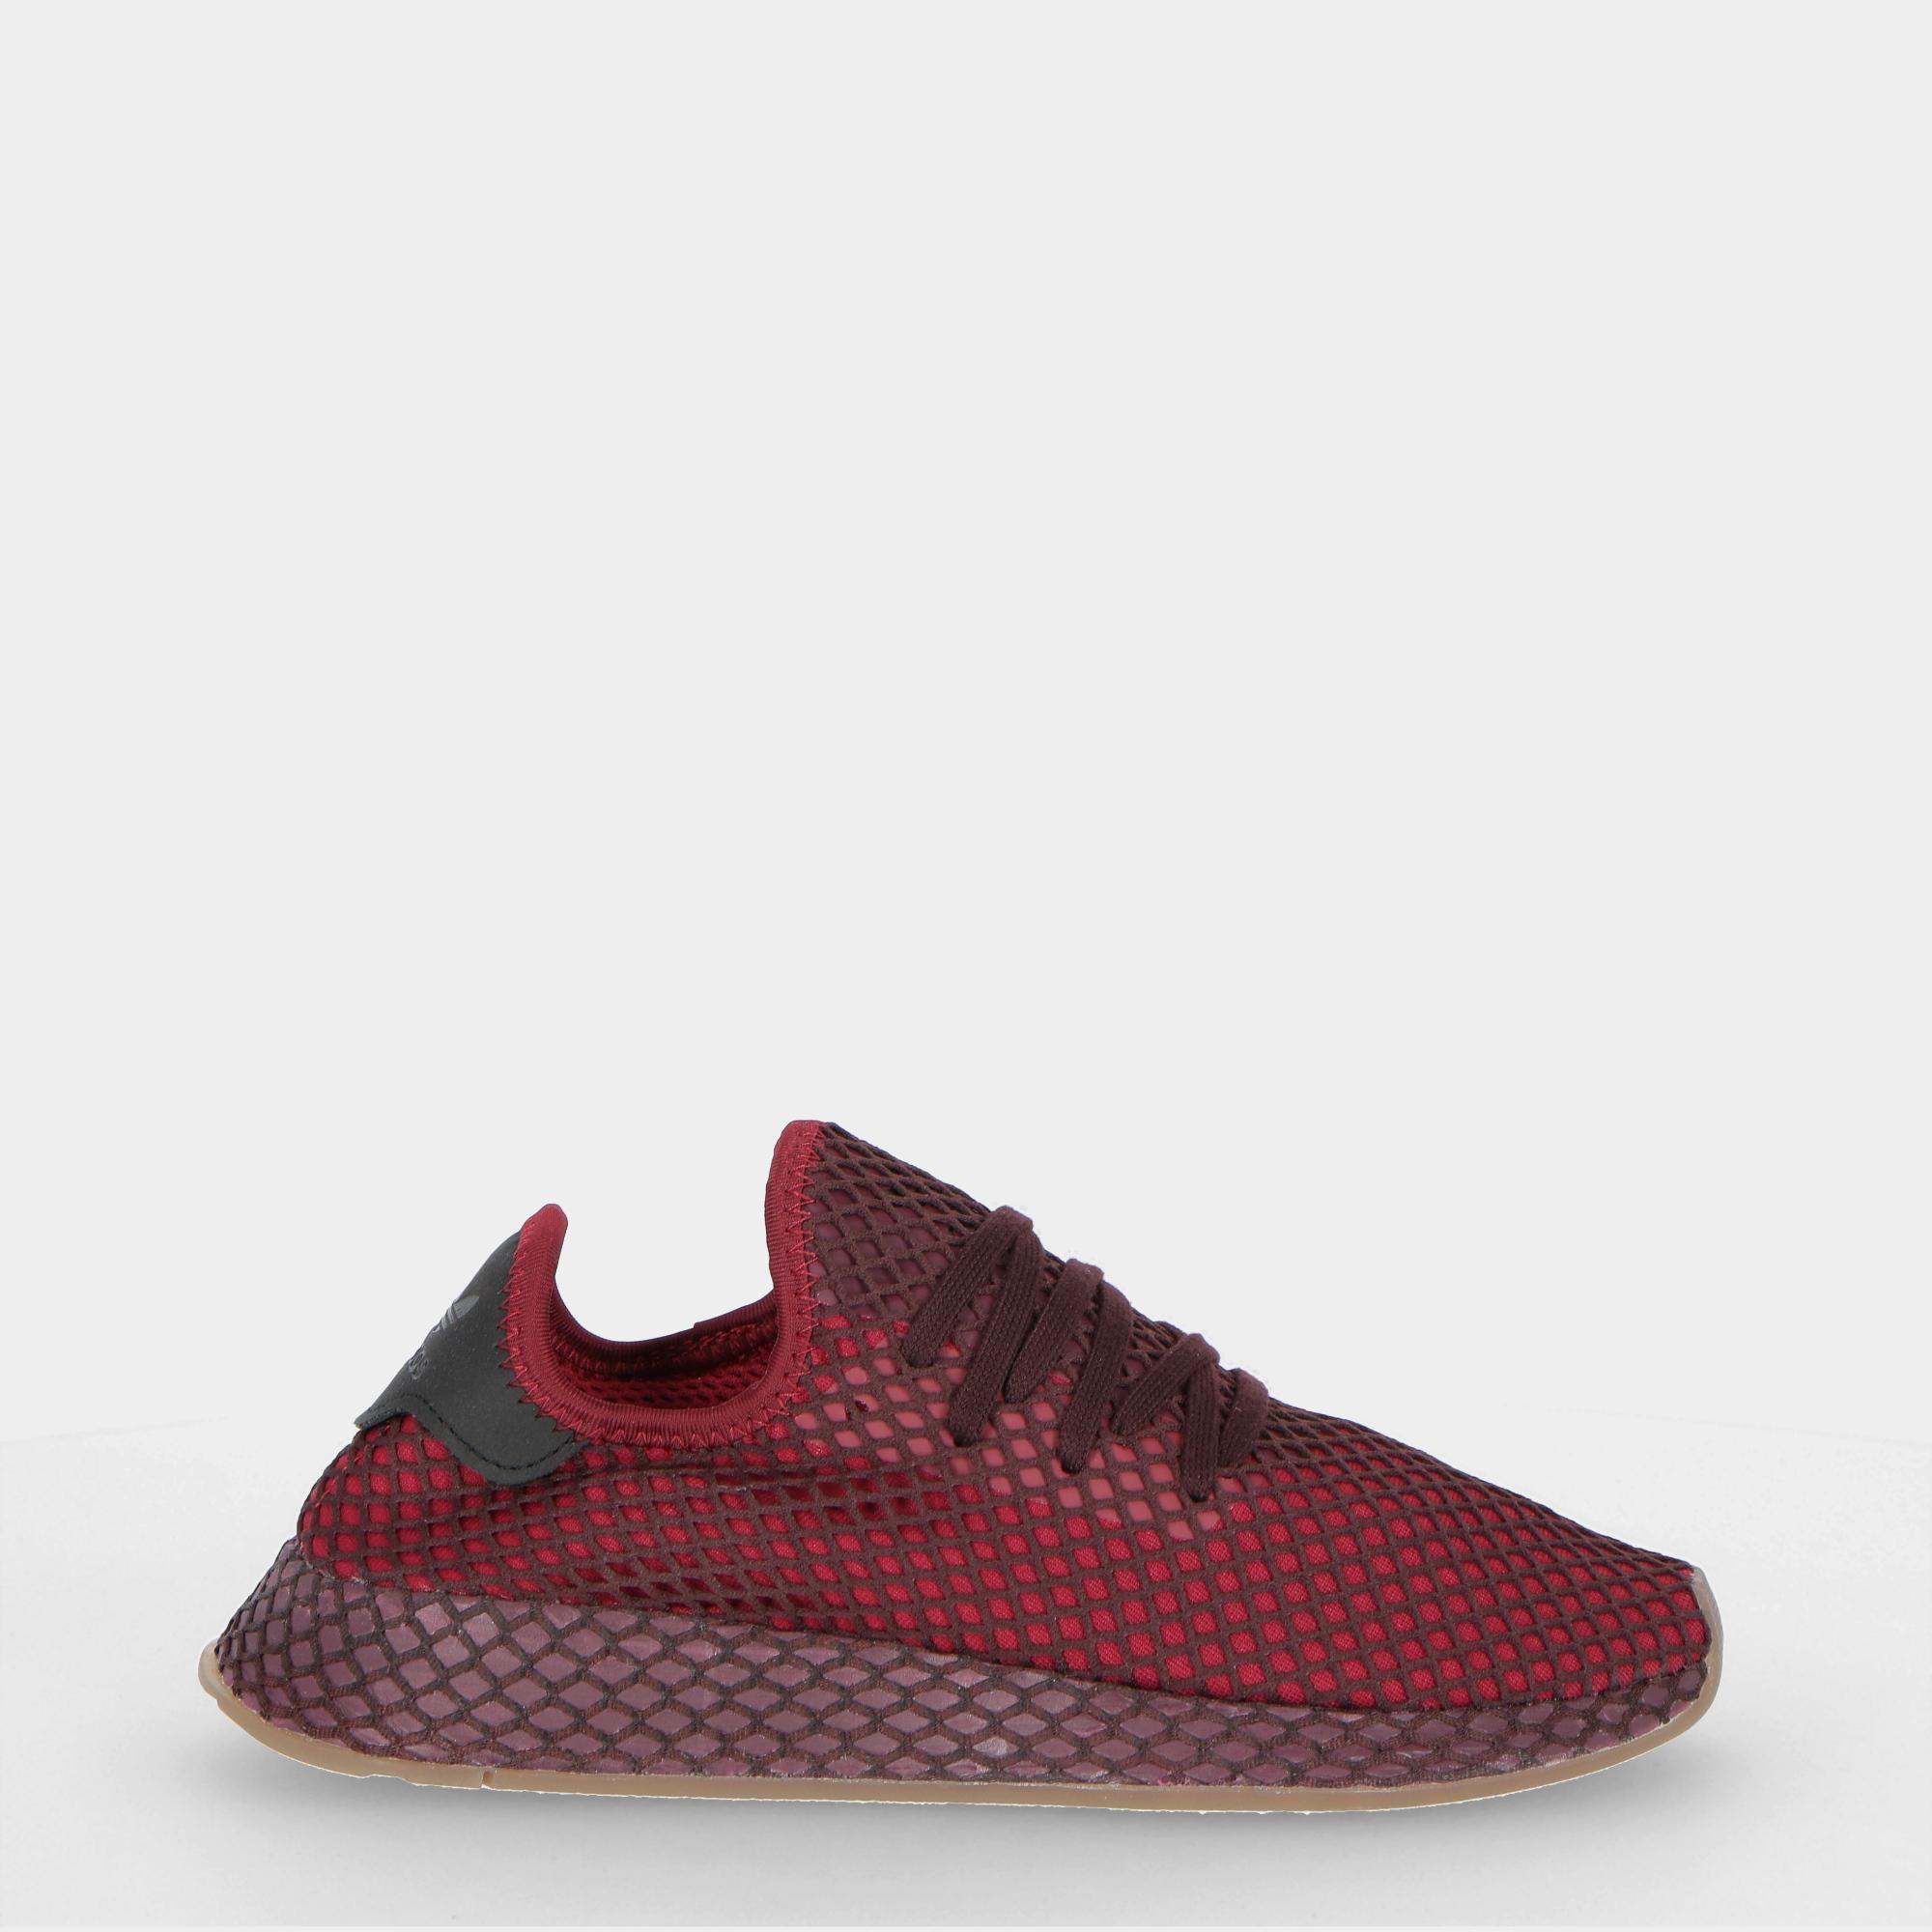 3a8329eafe067 Adidas Deerupt Runner Burgundy Ash Green